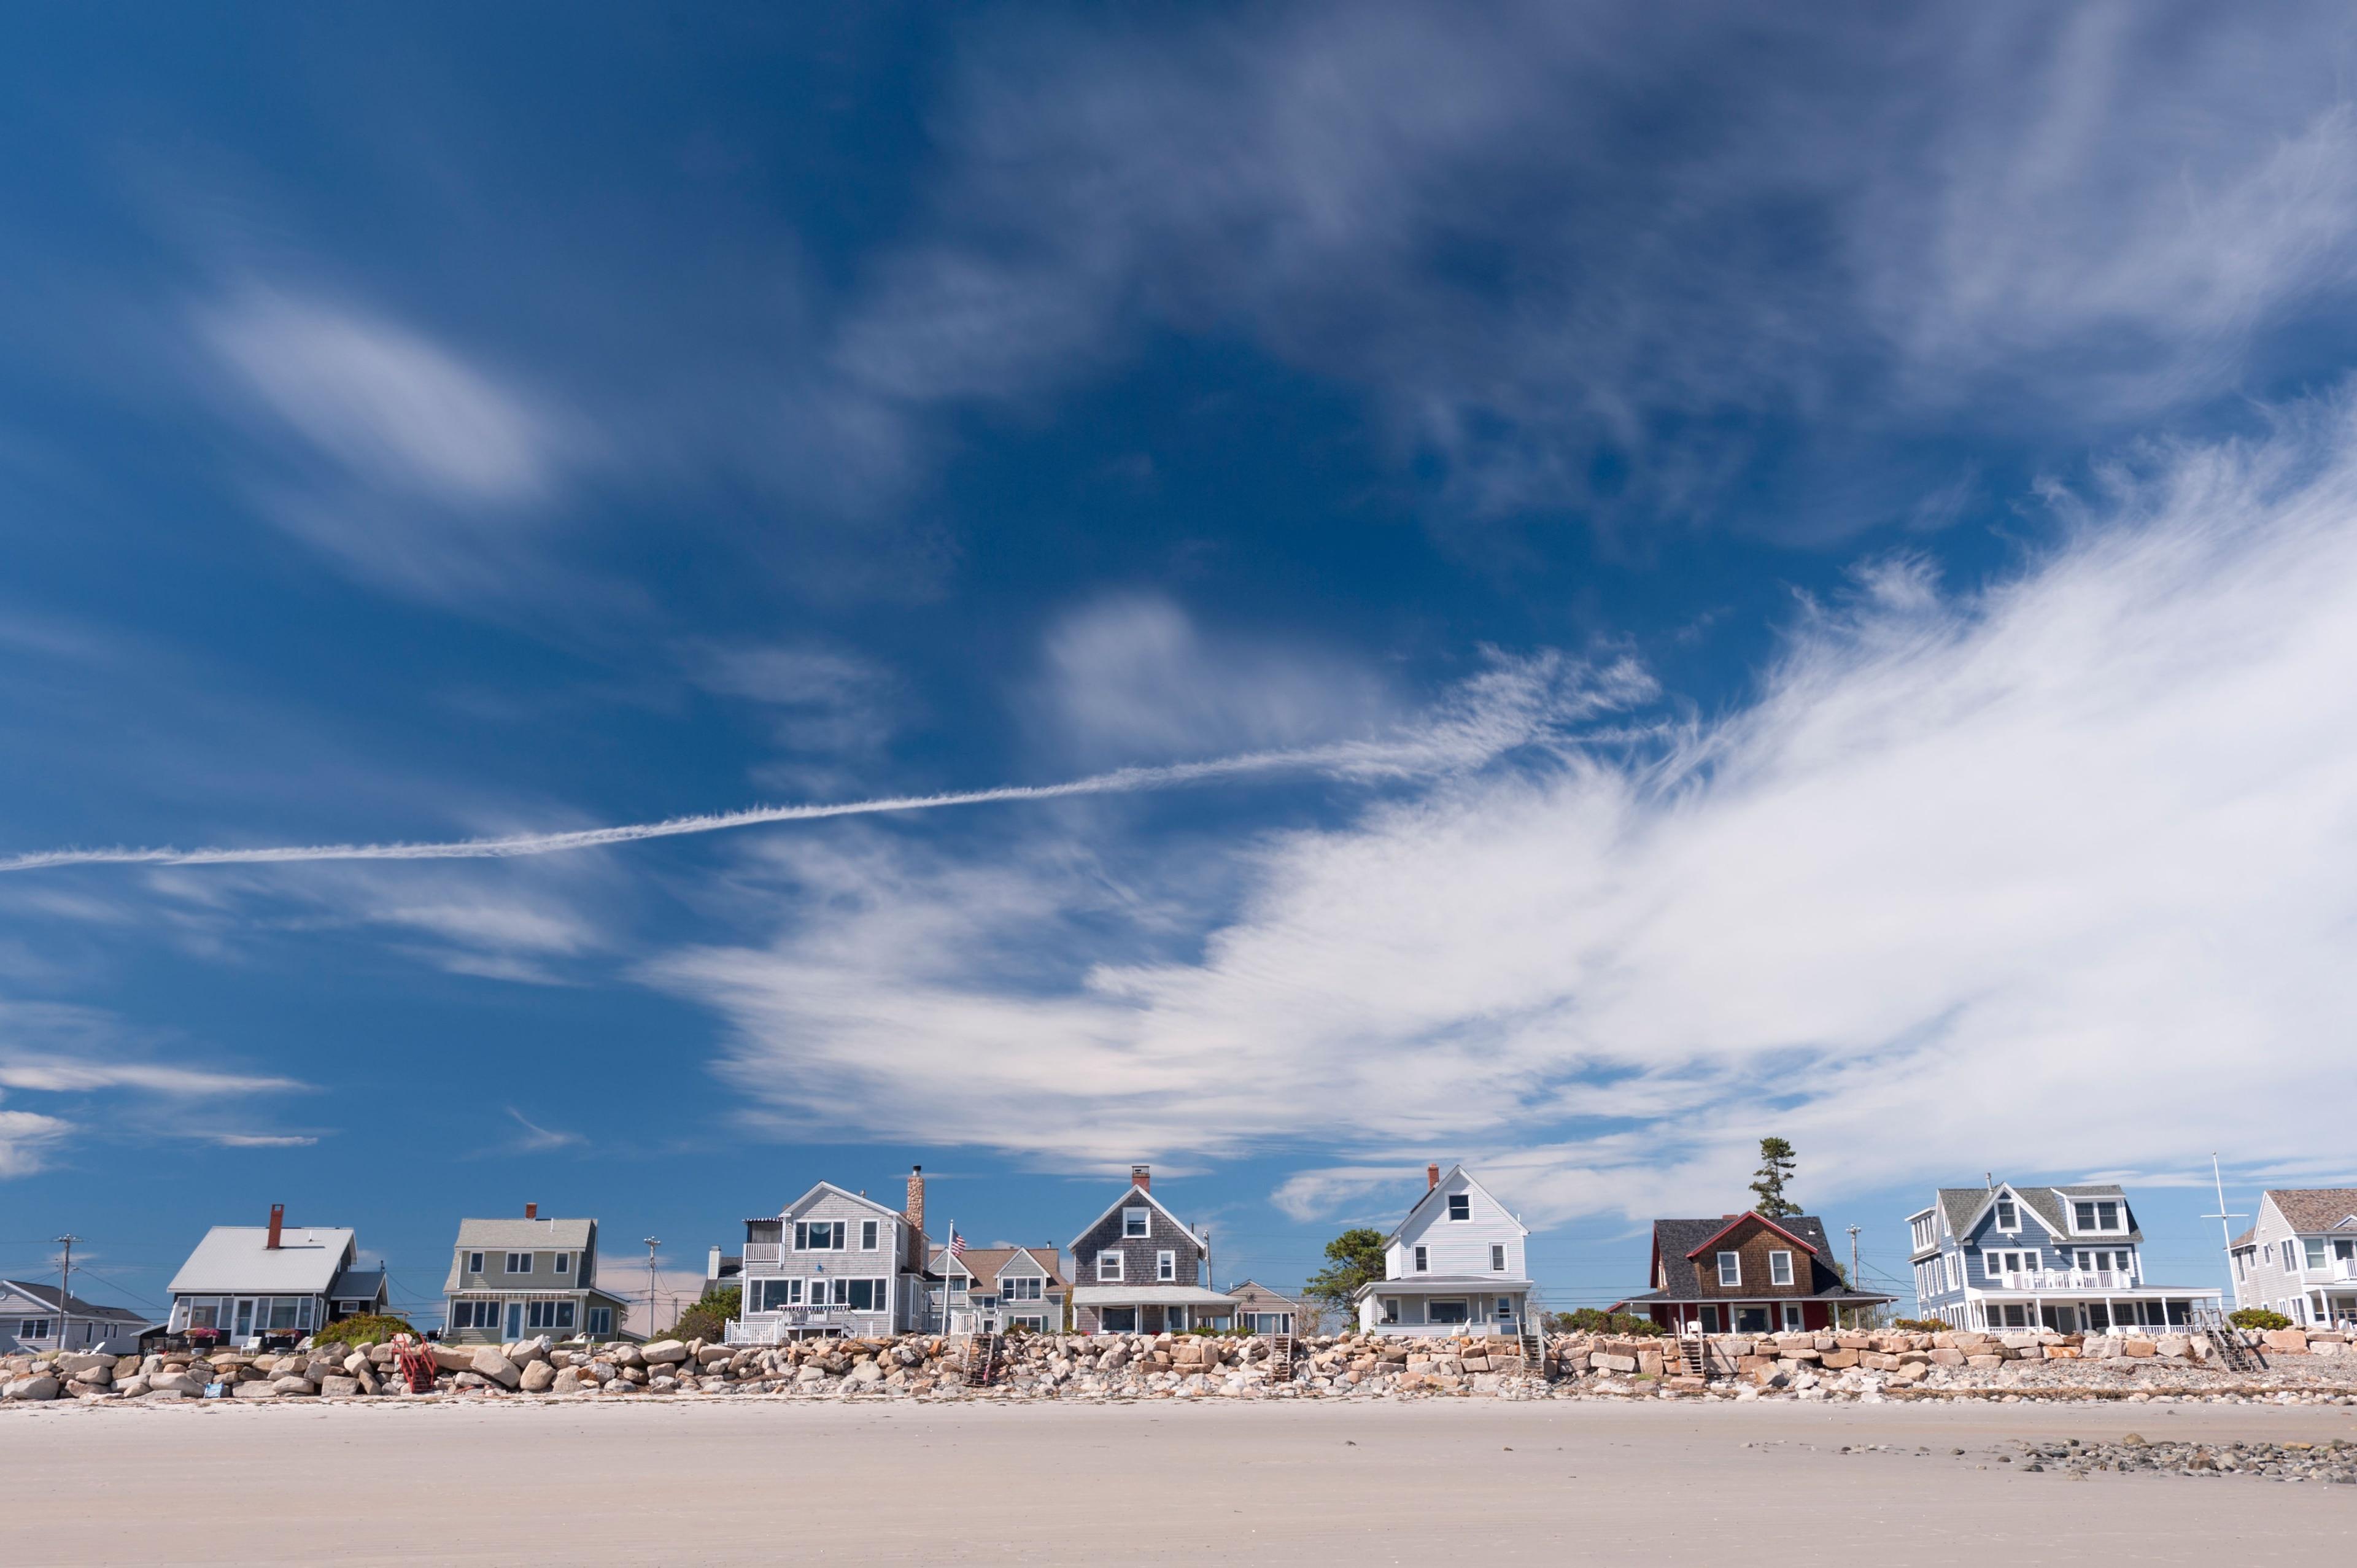 Moody Beach, Maine, United States of America